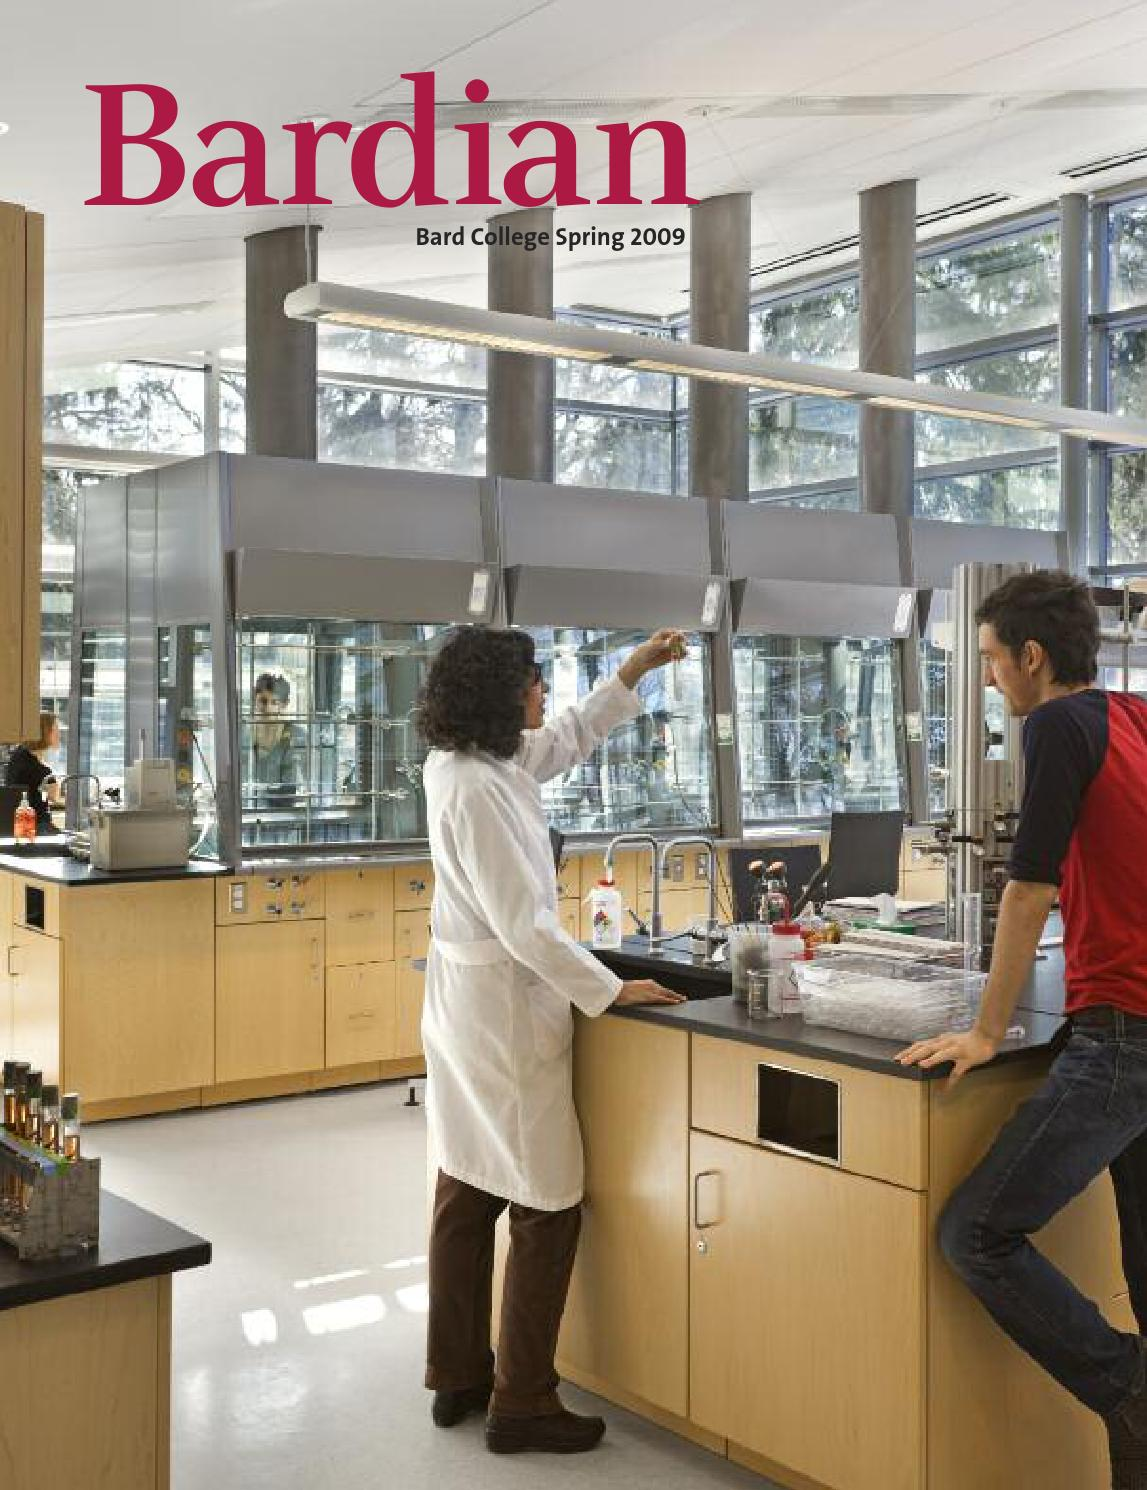 2009 Spring Bardian by Bard College Bardian - issuu